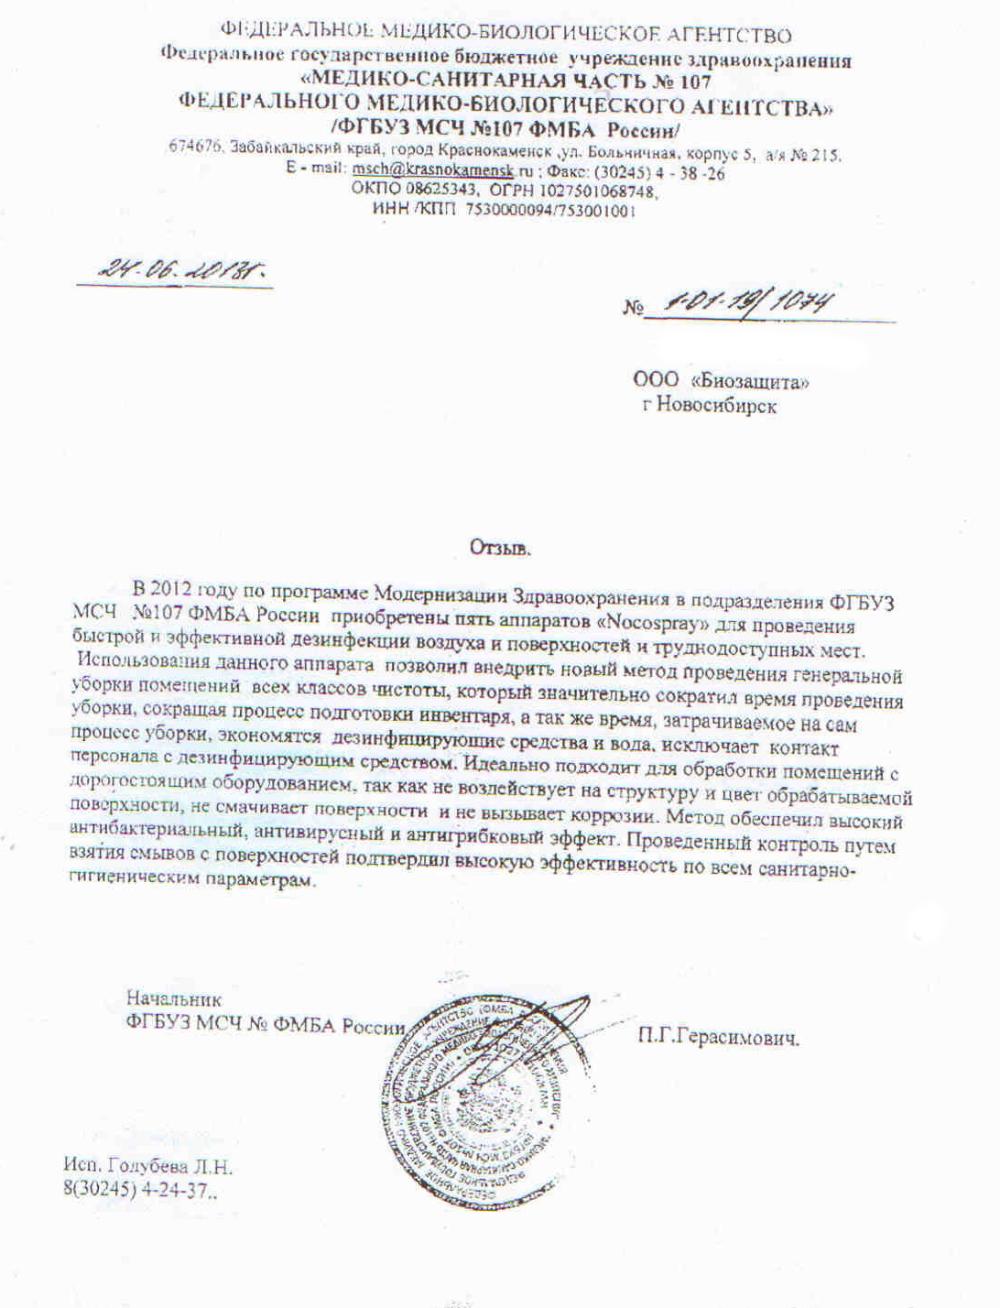 Отзыв от ФГБУЗ  МСЧ №107 ФМБА России